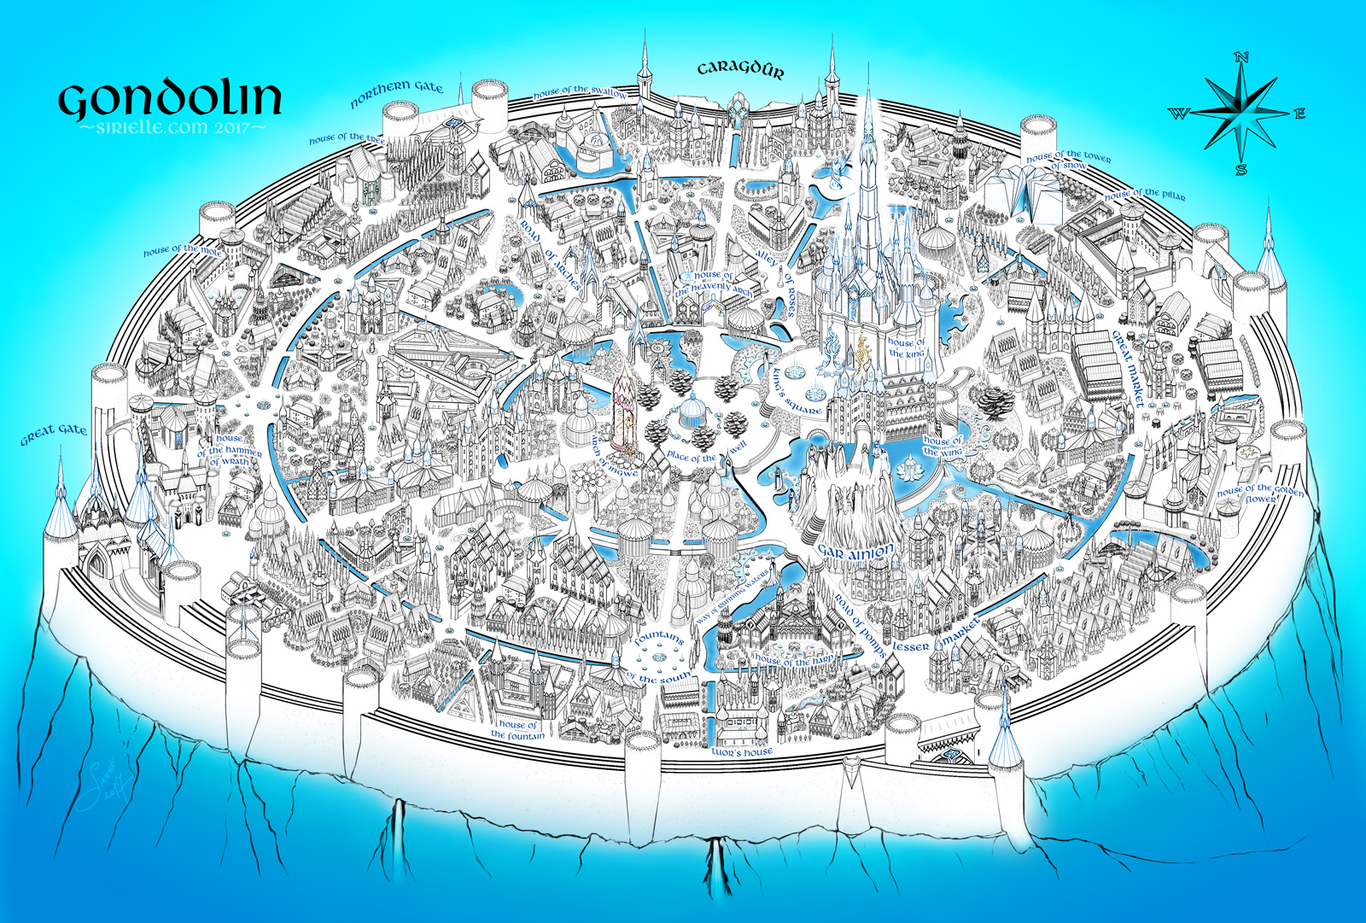 Gondolin in blue